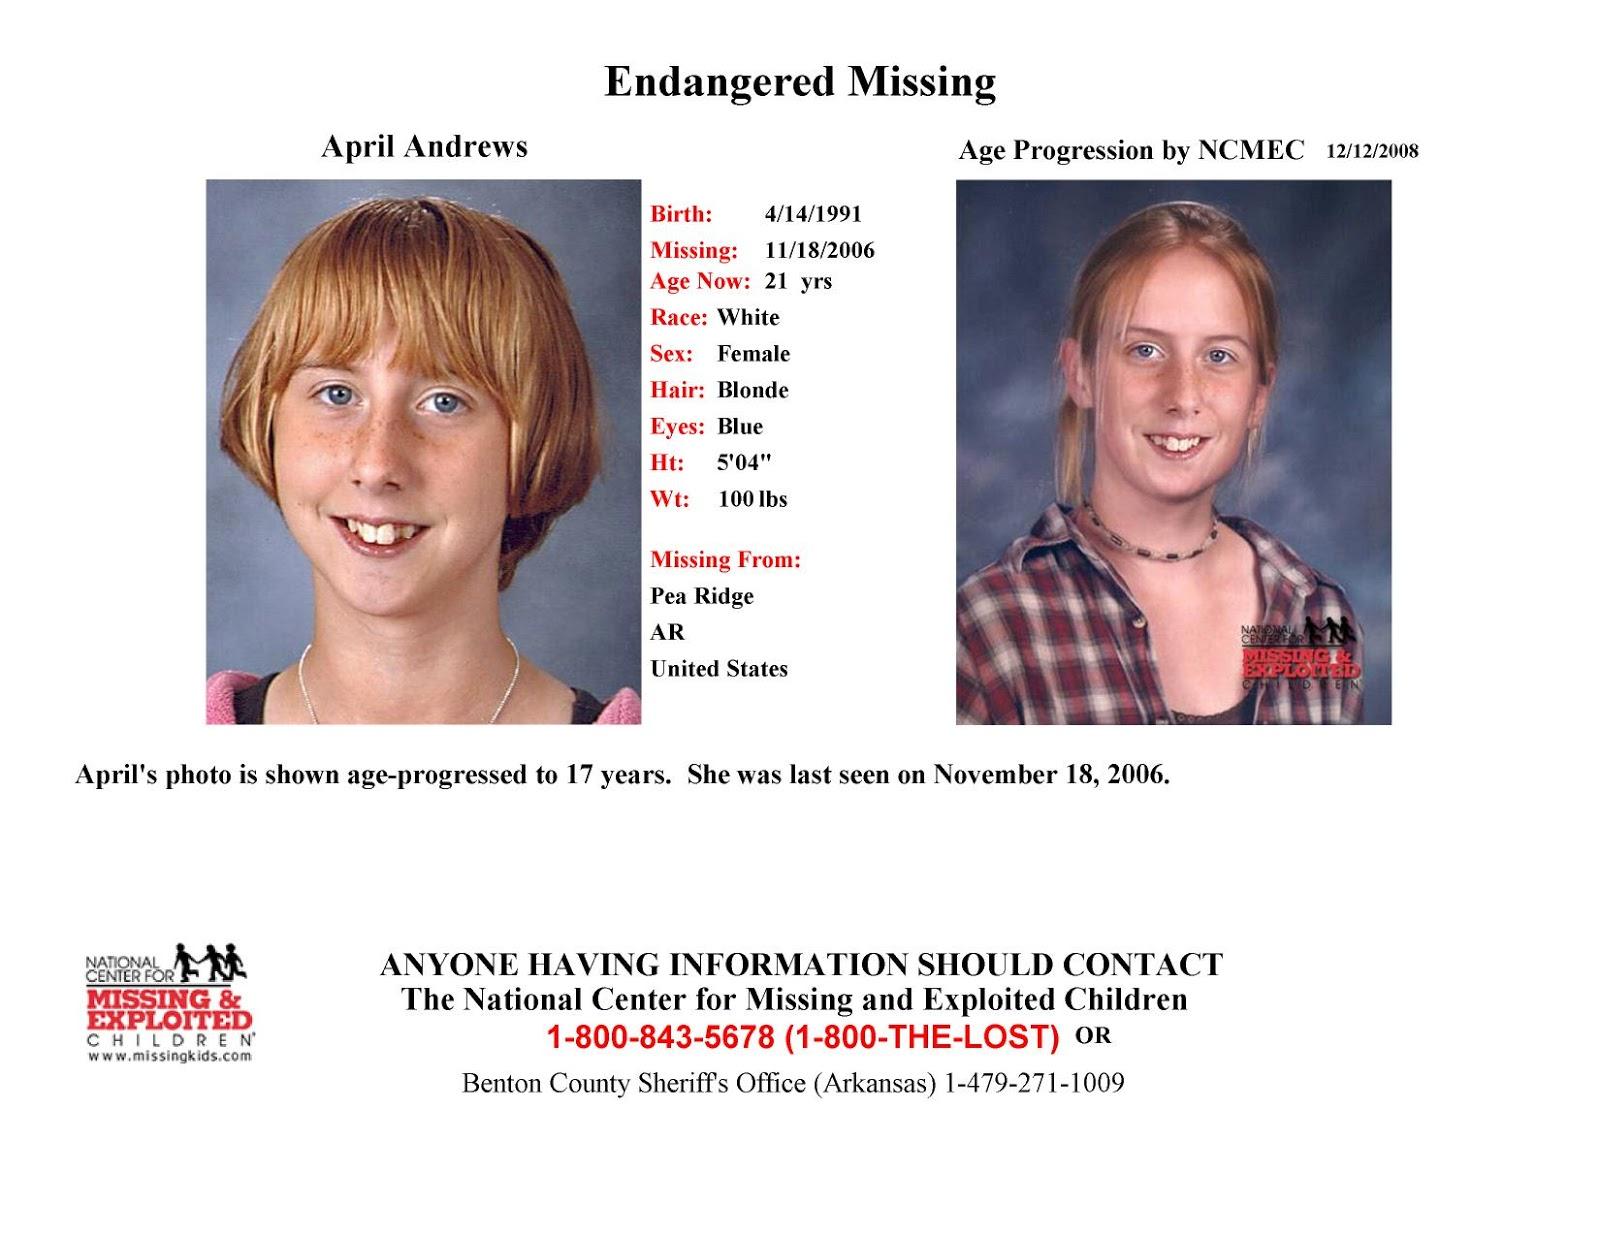 Cold Case: Missing teen still missing from Arkansas 9 years